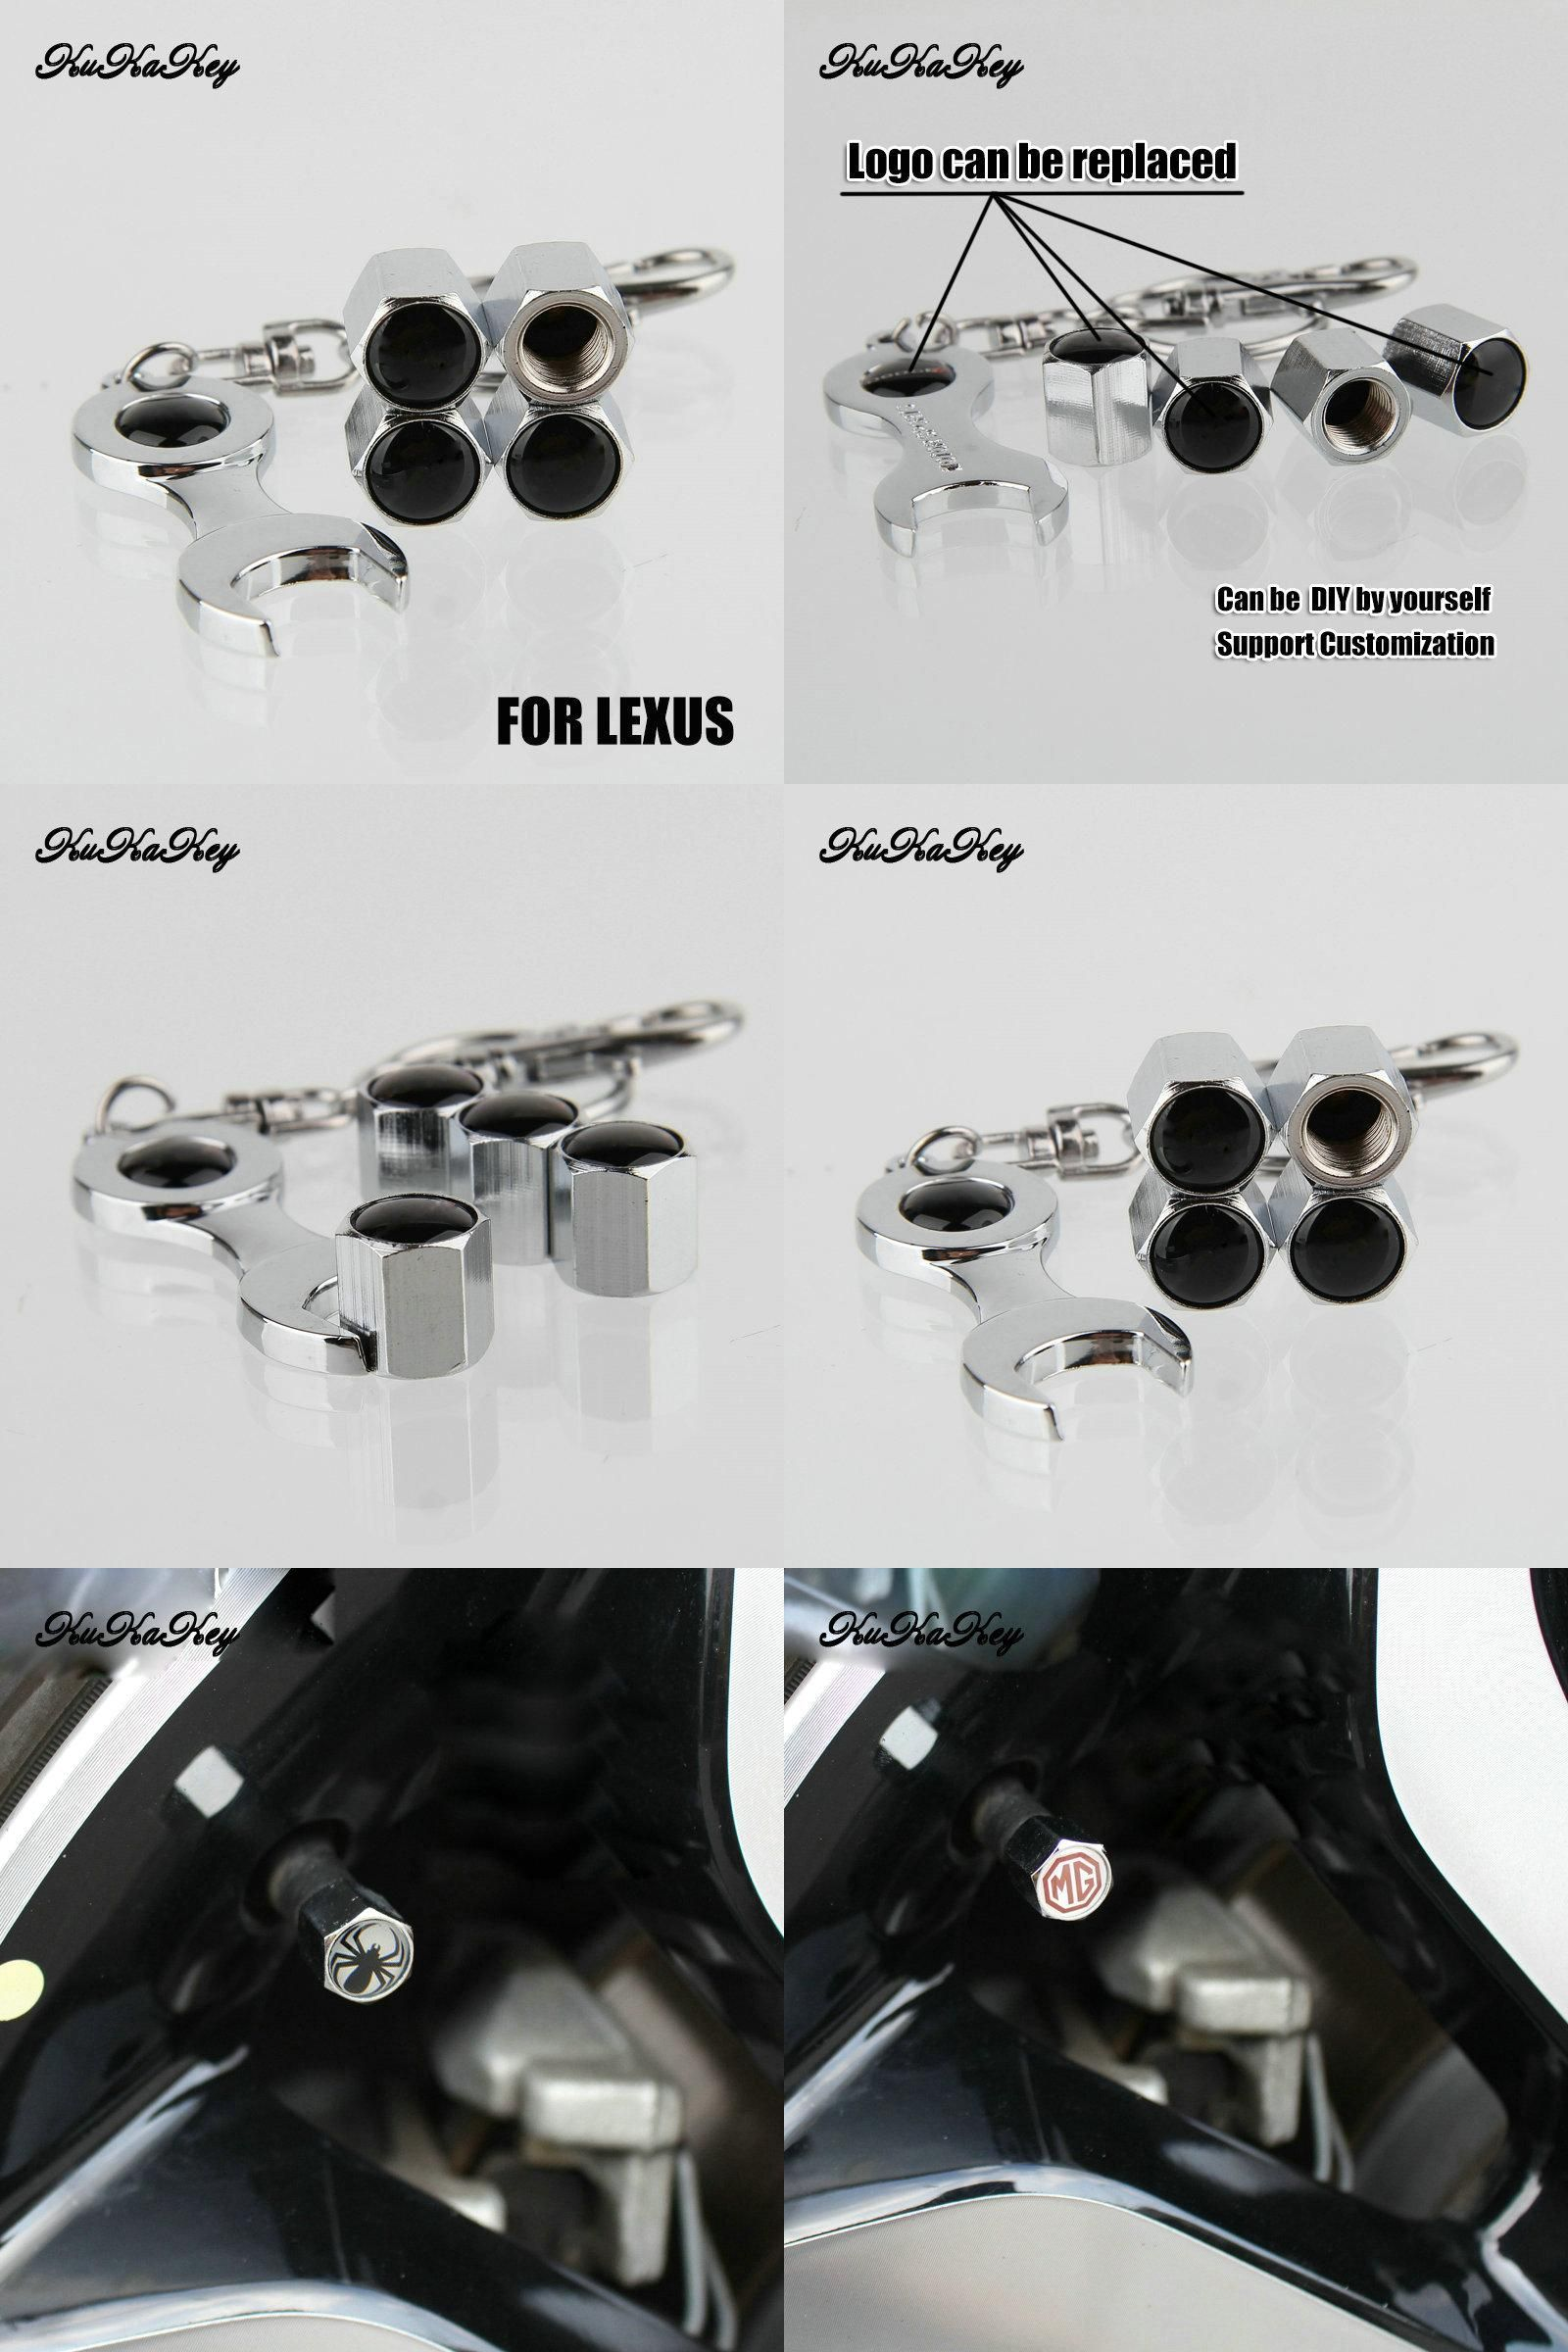 Visit to Buy] 4 Caps 1 Wrench Metal Motorcycle Wheel Tire Valve